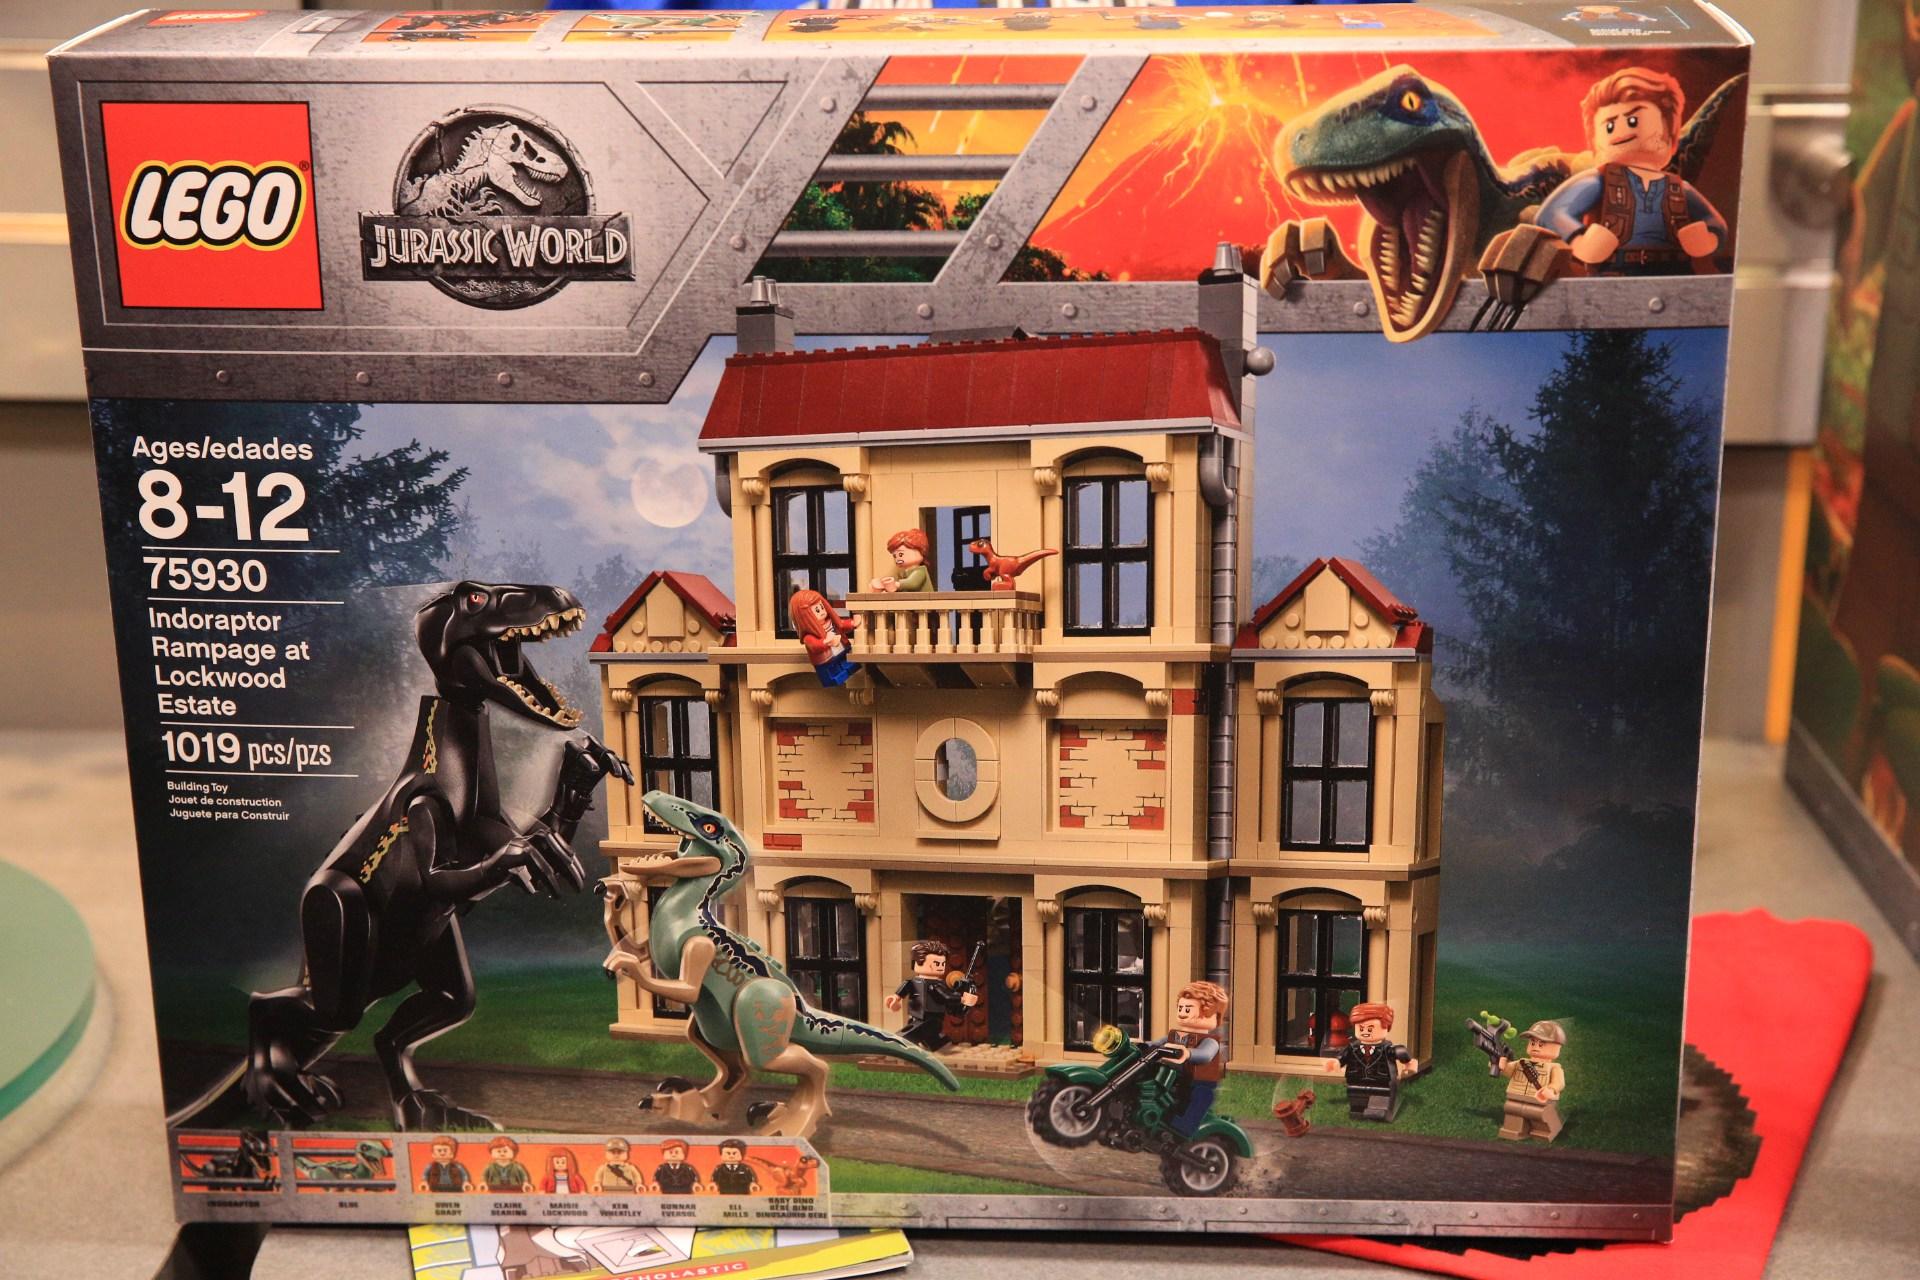 Lego jurassic world 2 set 75930